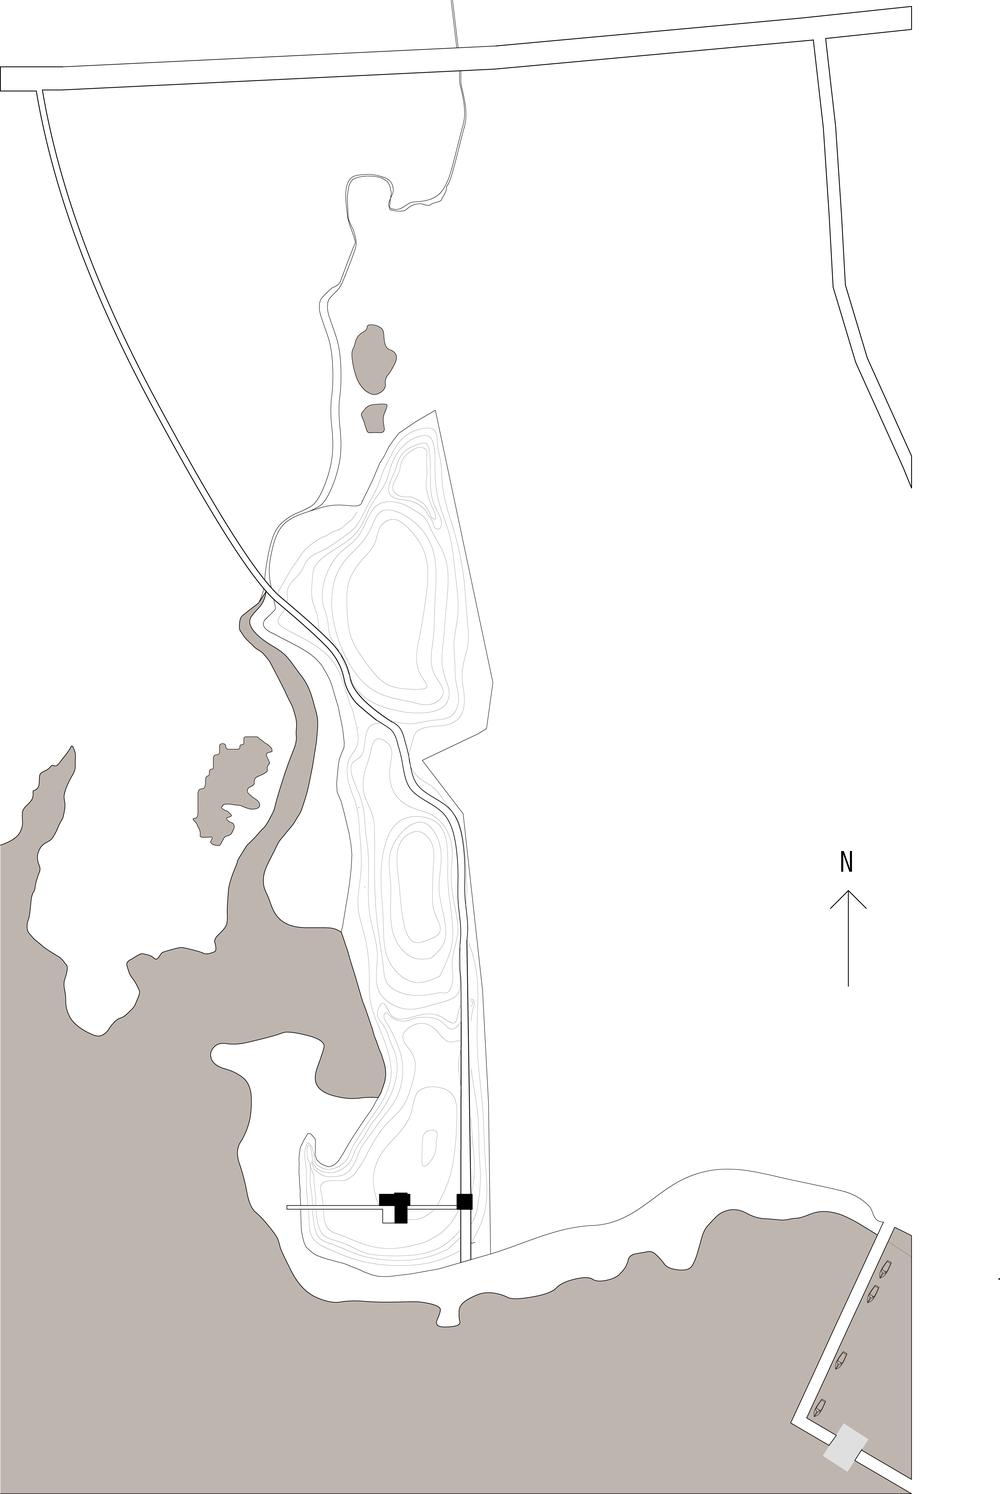 KEY MAP